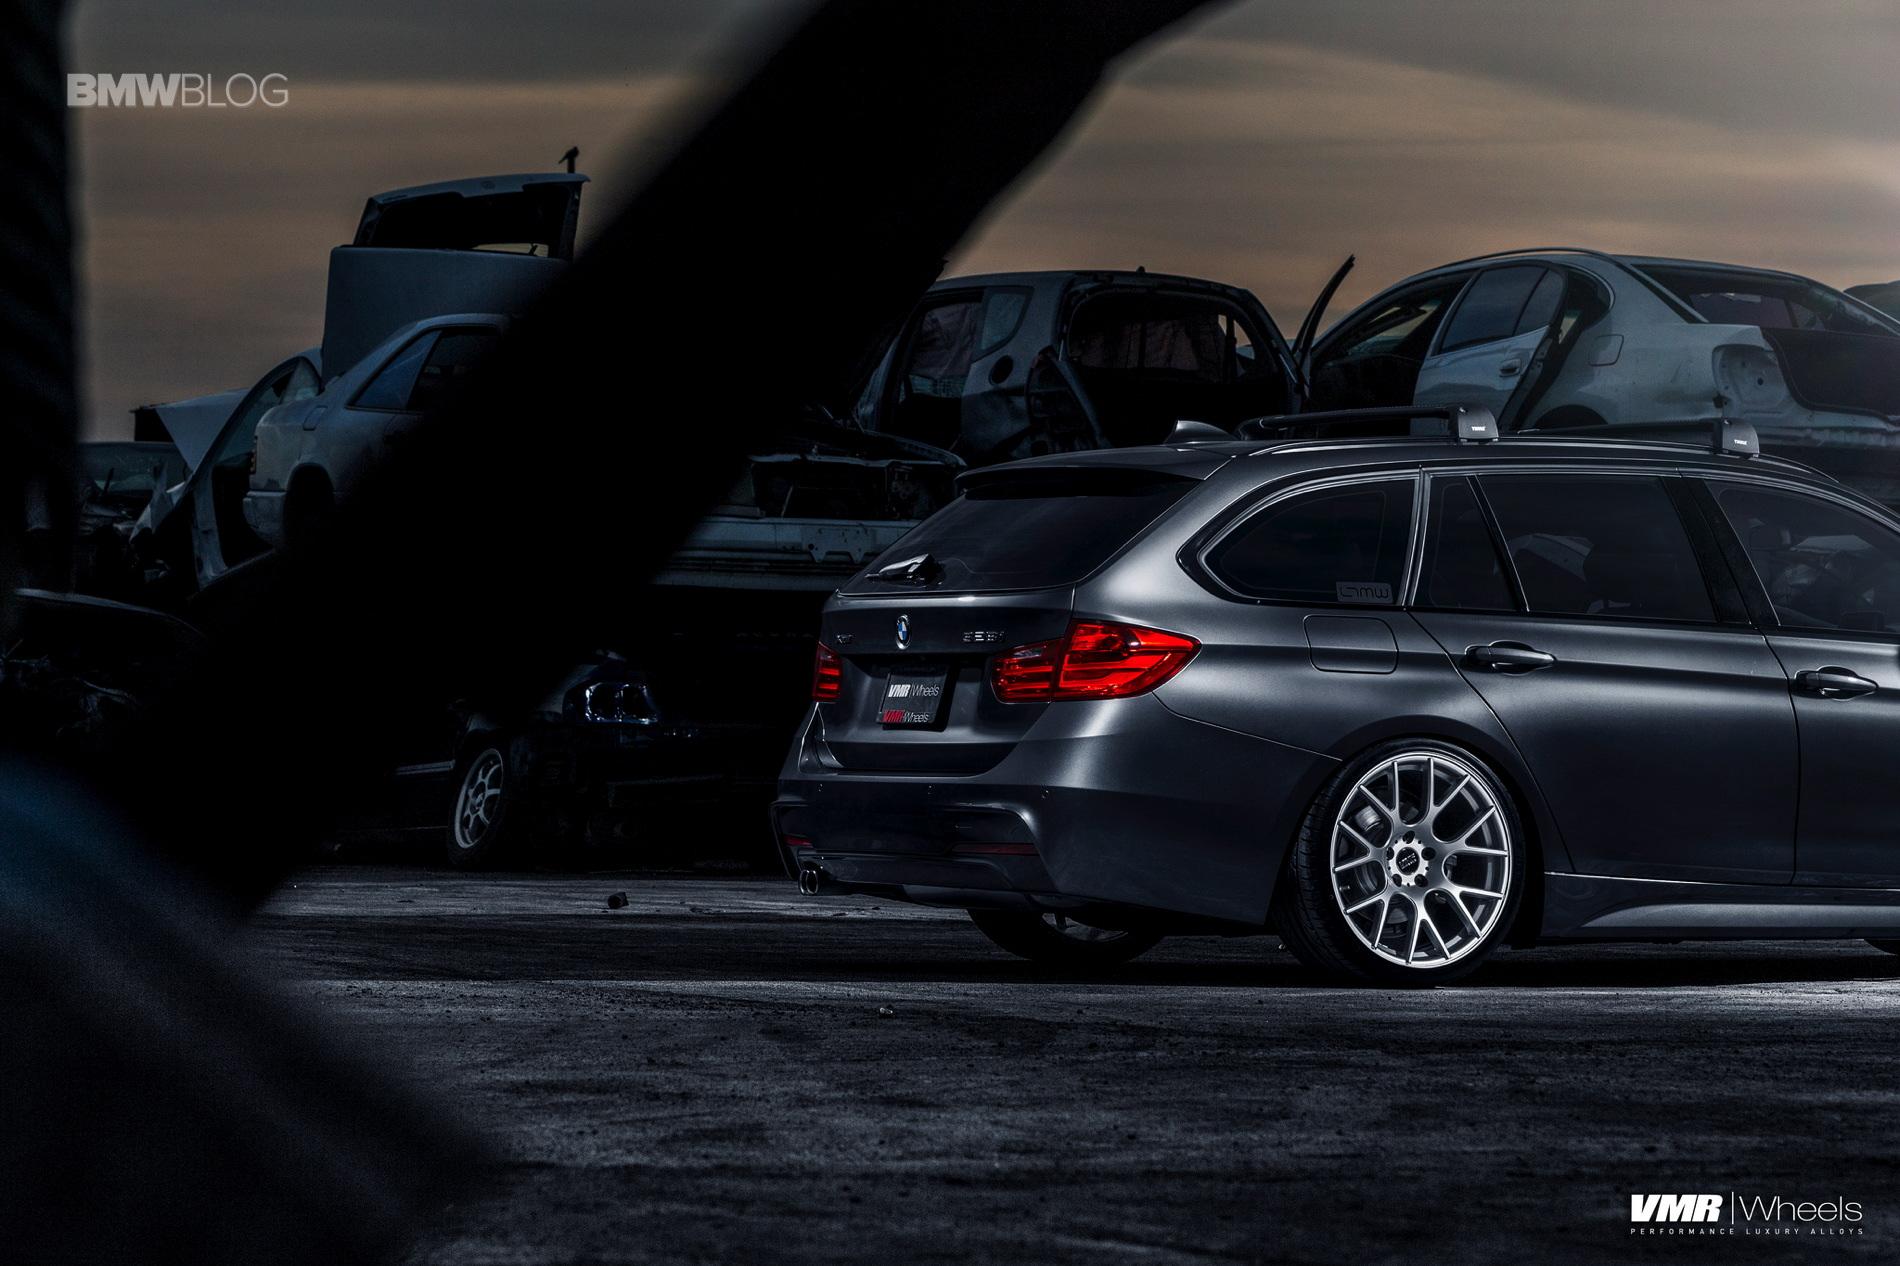 2016 BMW 328I >> BMW F31 Sports Wagon gets some visual upgrades and custom wheels